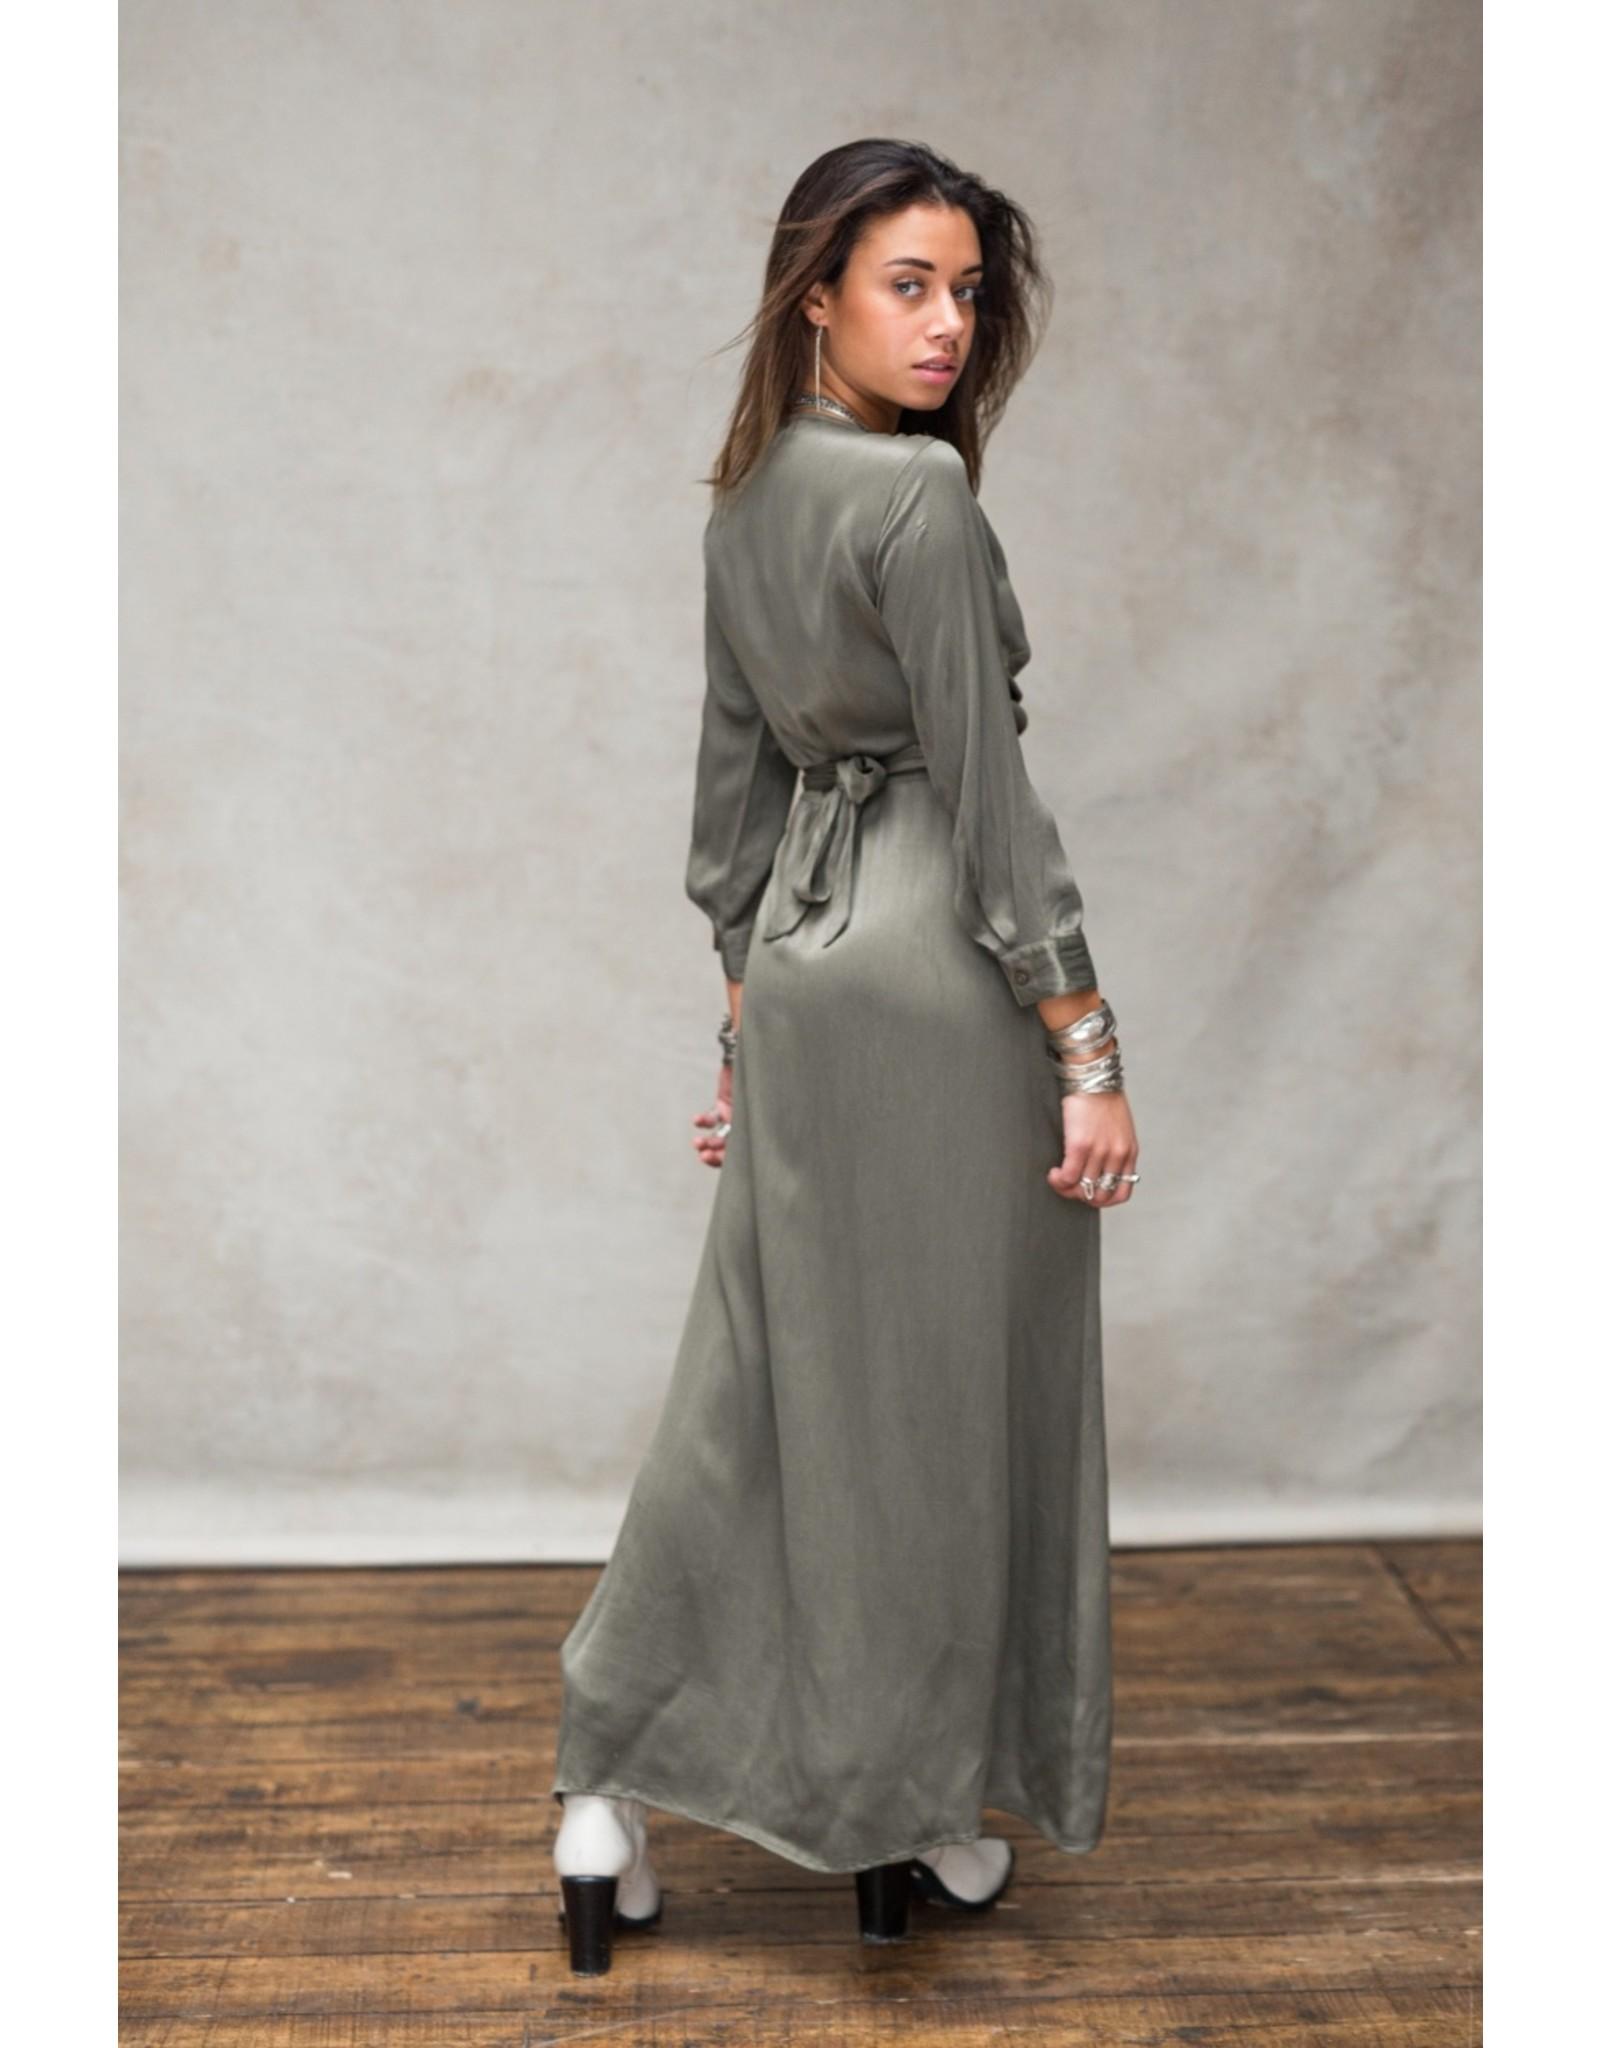 MW JULES SATIN WRAP DRESS - SENSUAL GREEN